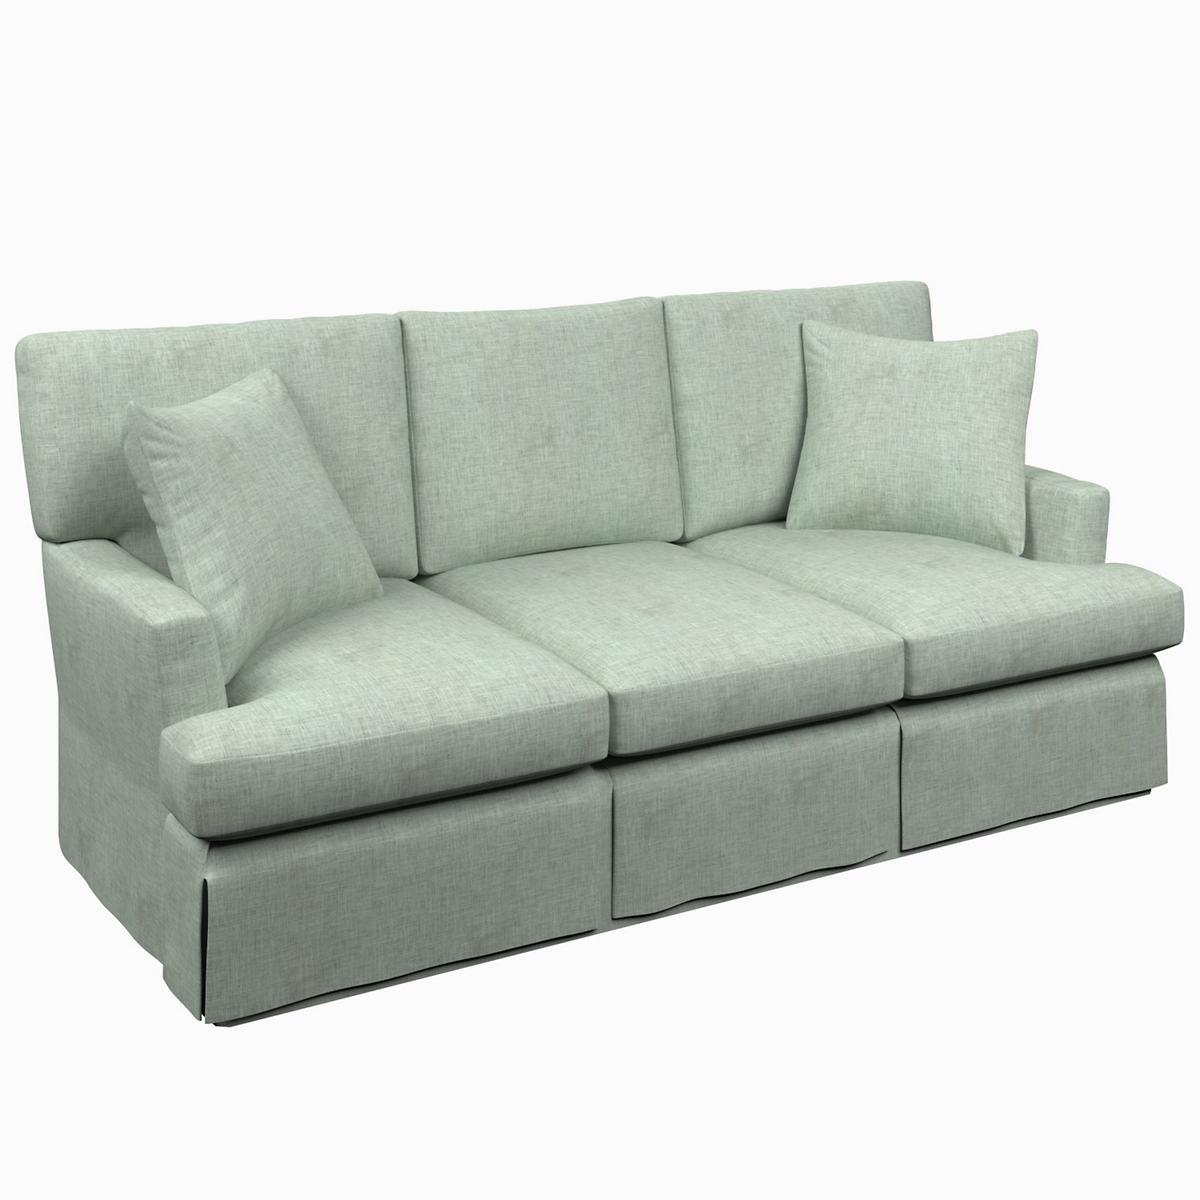 Greylock Light Blue Saybrook 3 Seater Upholstered Sofa